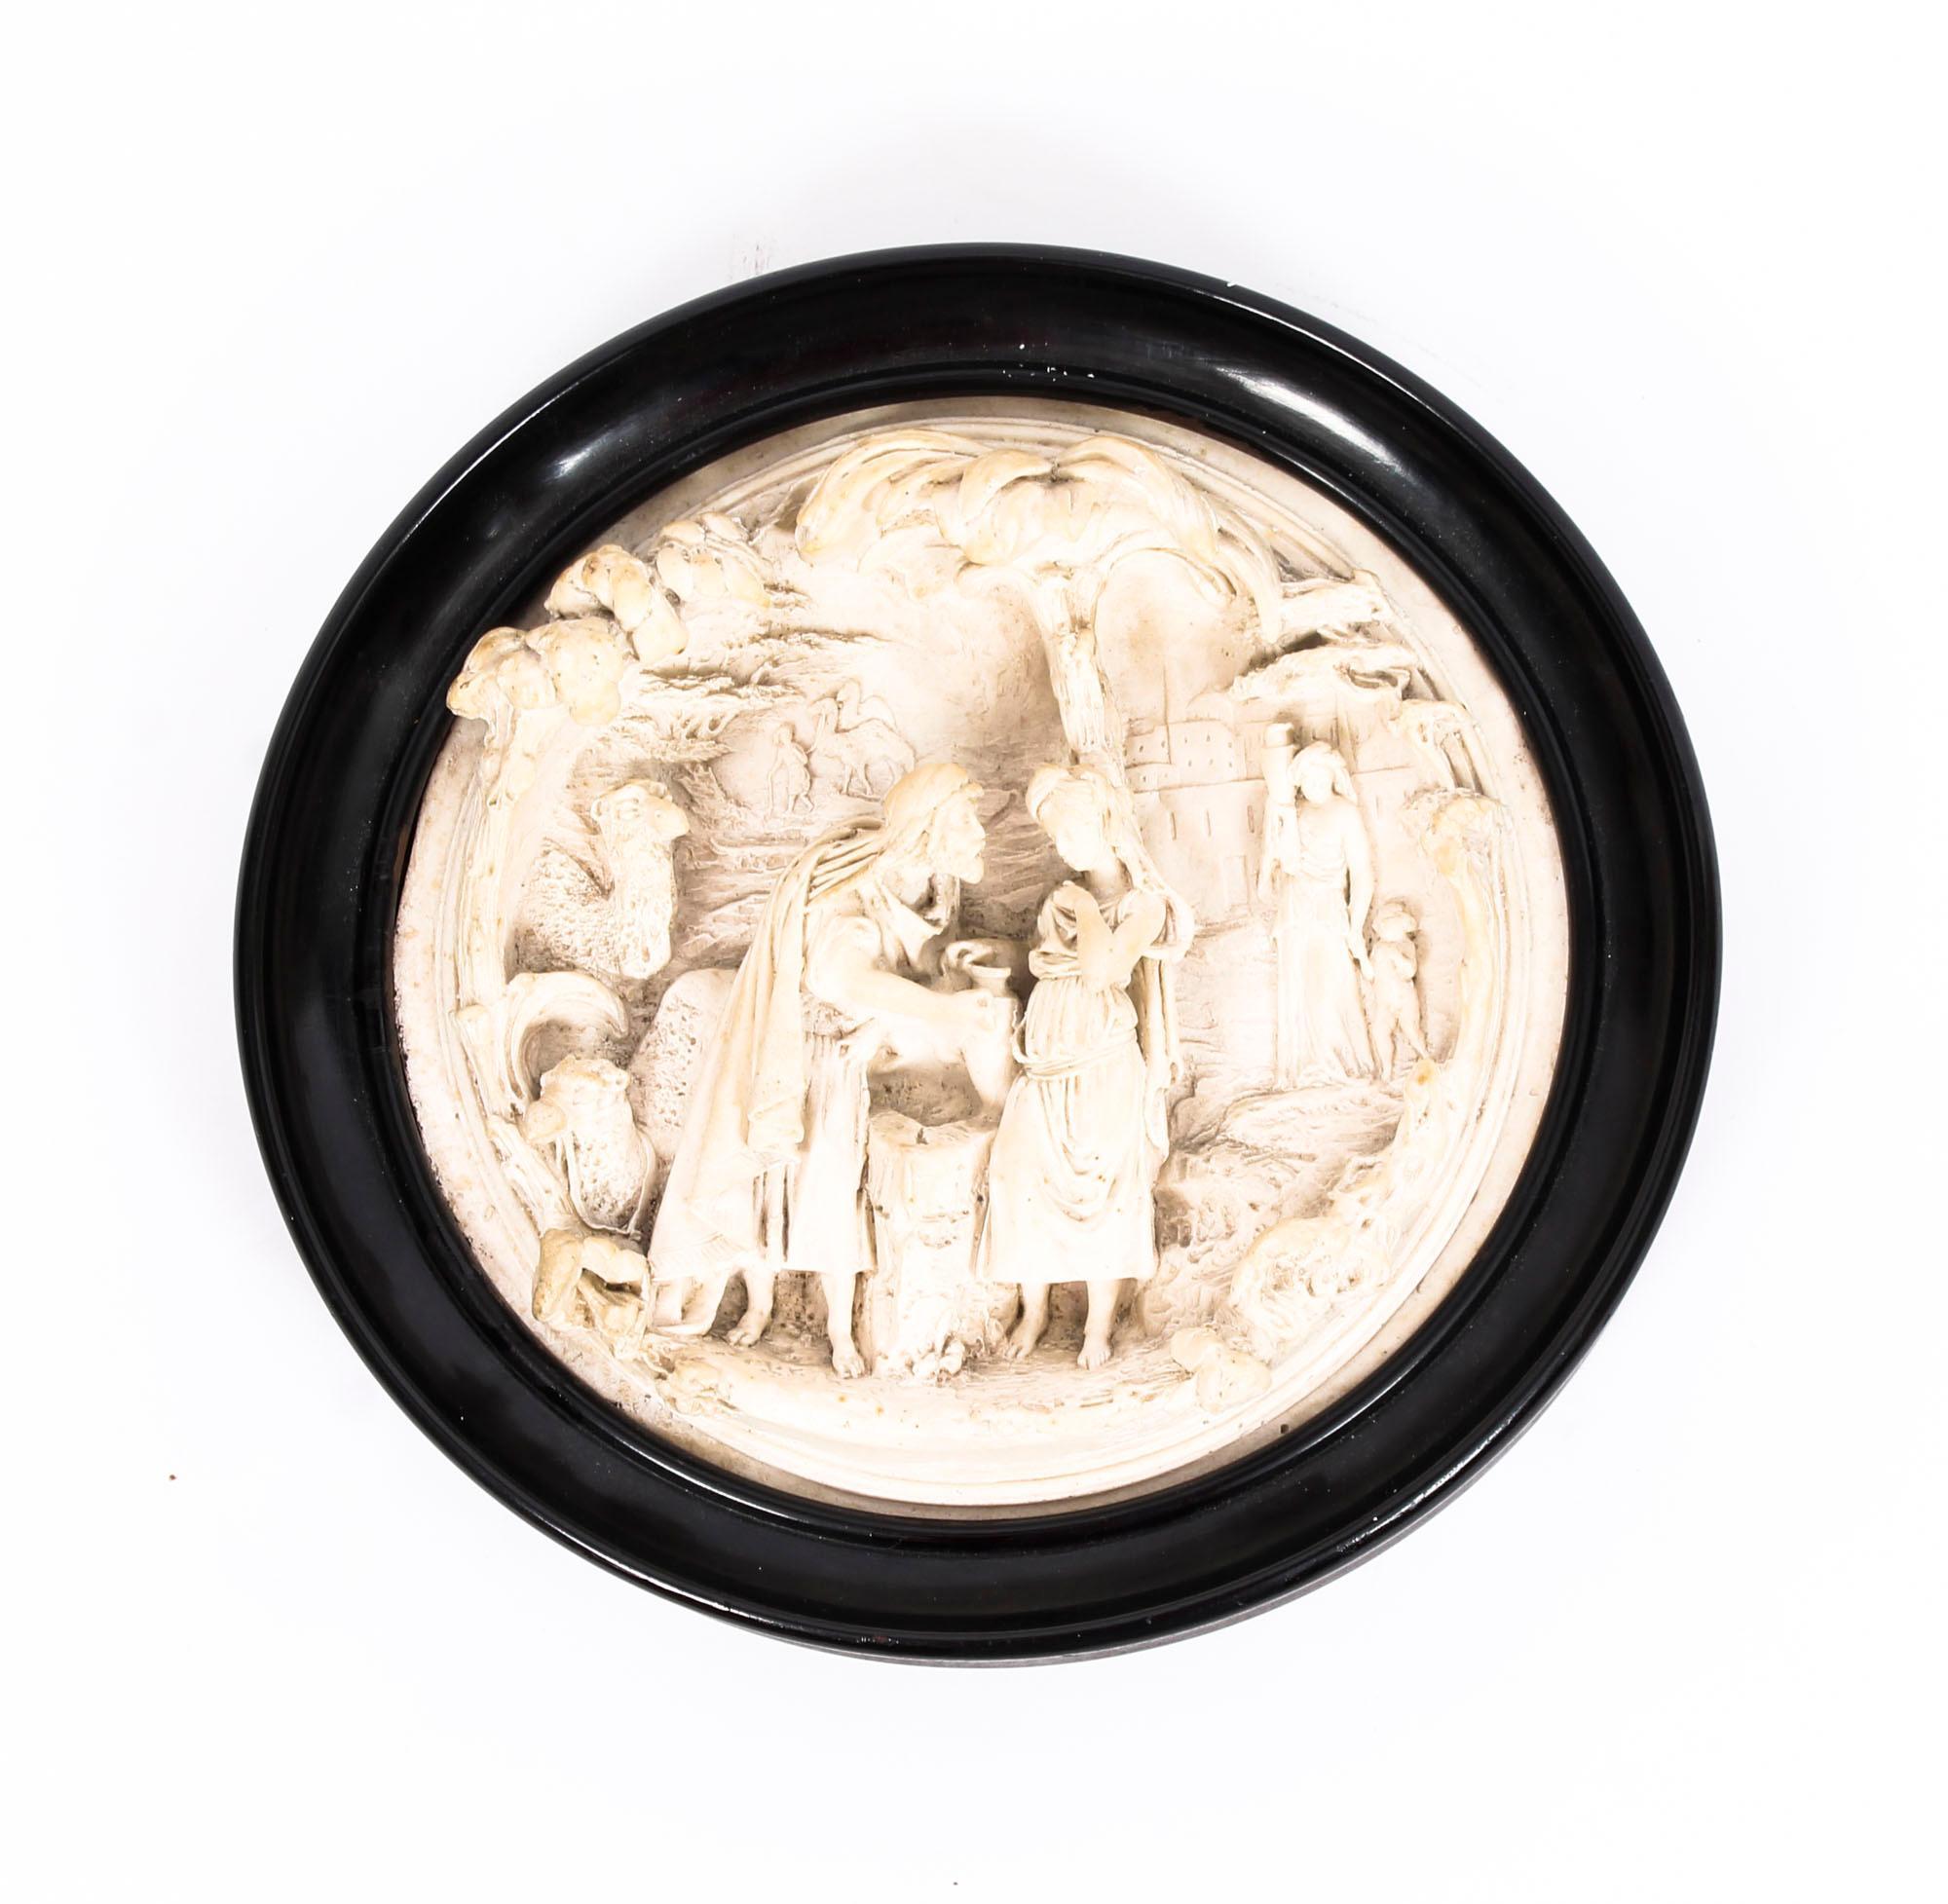 Stunning classical Lady Horse Theme Grand Tour Intaglio gem wall decor plaque